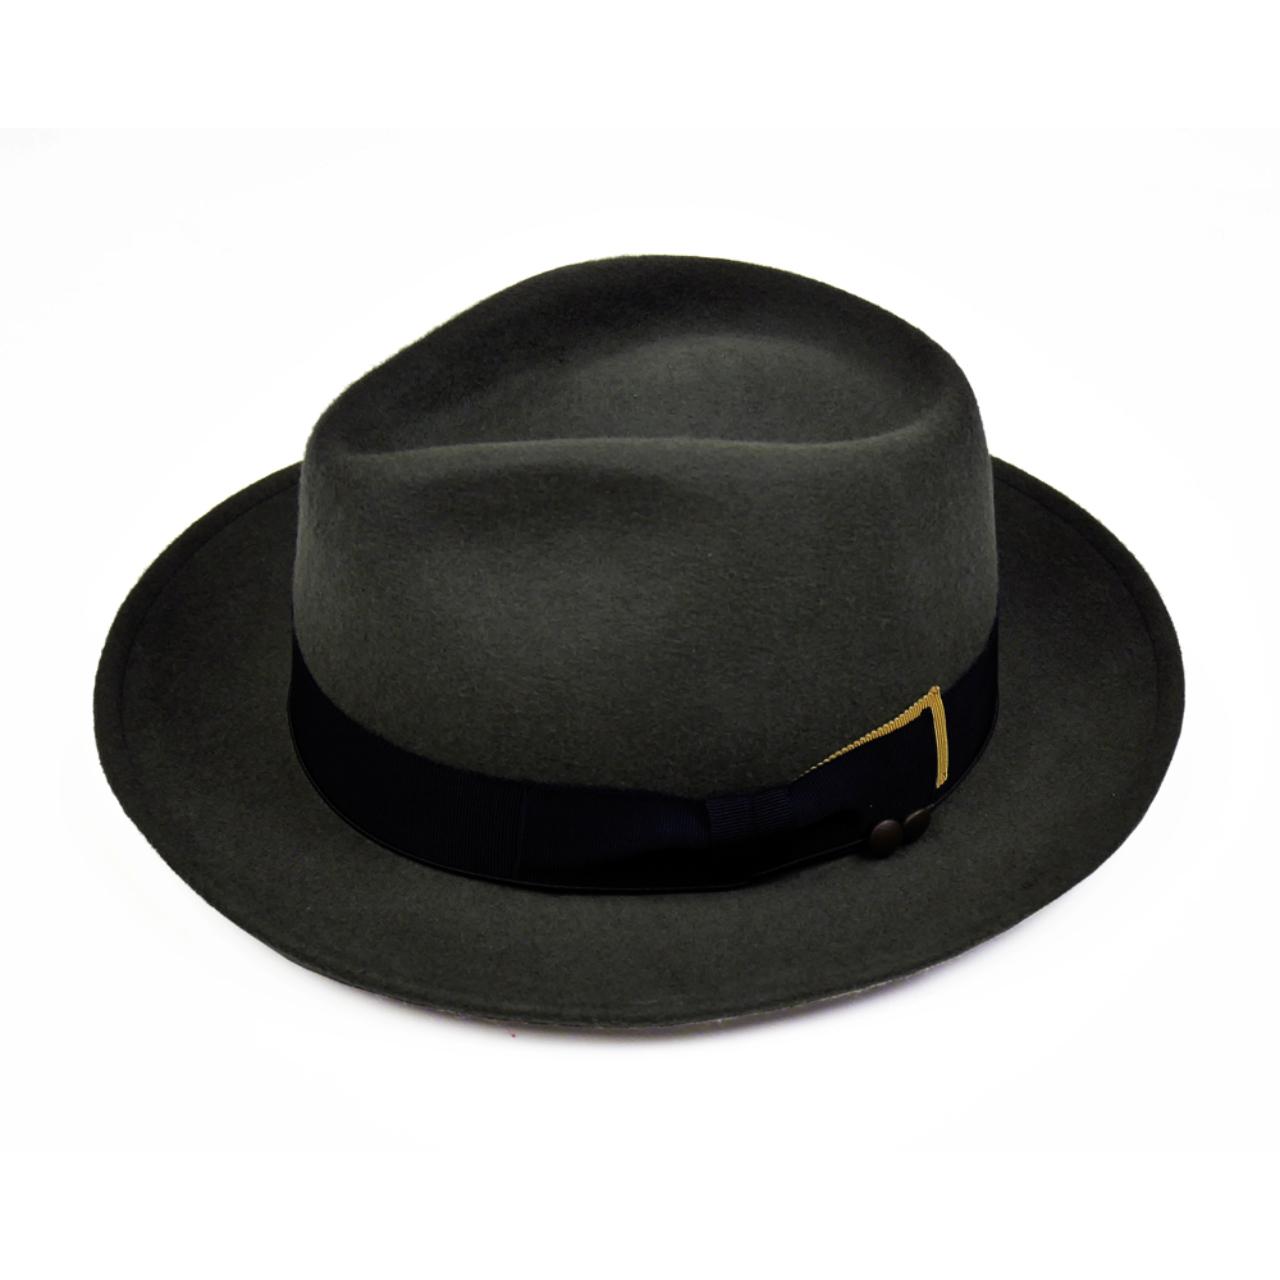 TOP KNOT | HAT STANDARD - Grey [82024002]